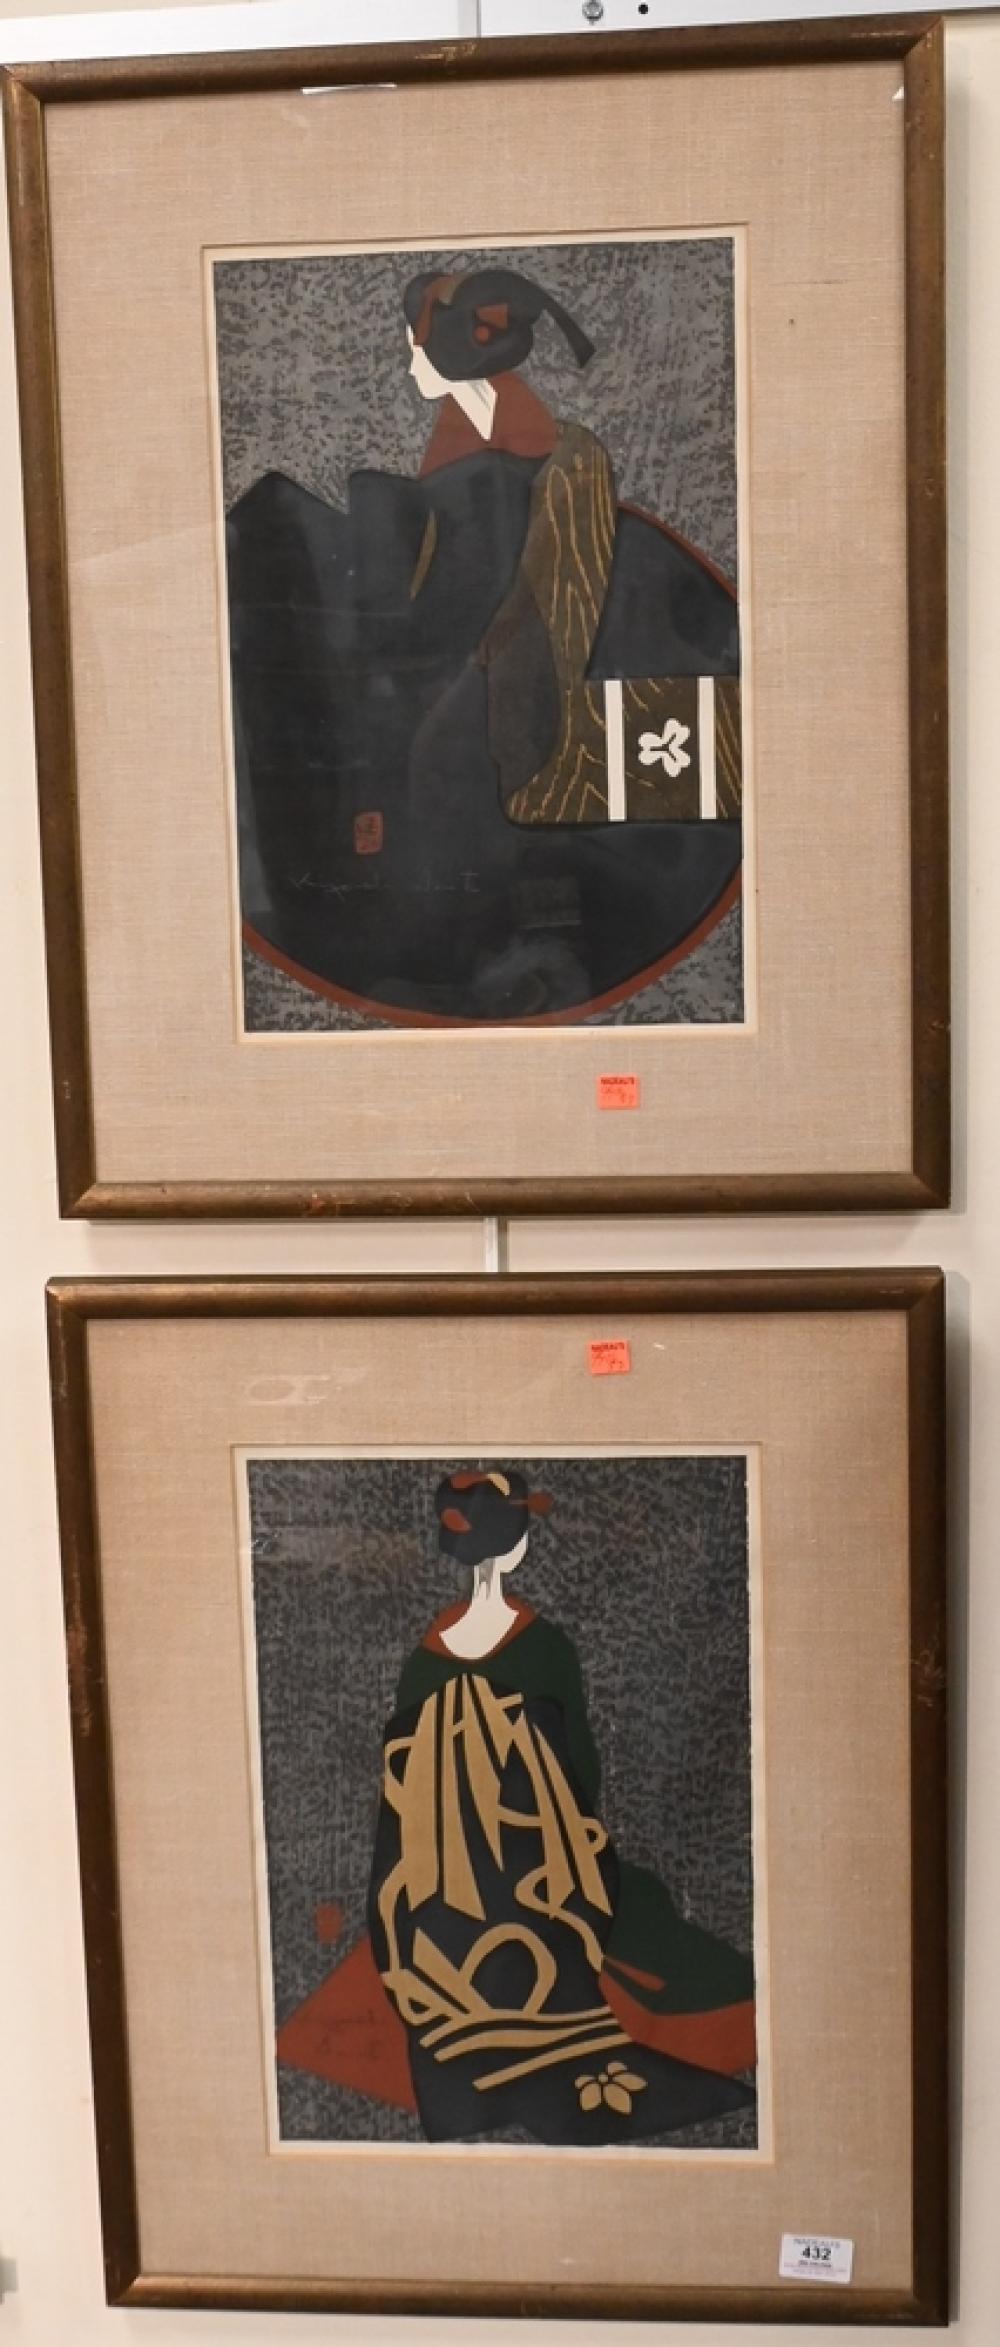 Pair of Kiyoshi Saito1907 - 1997Japanese Woodblocksto include Maiko and Geishaboth pencil signed Kiyoshi Saito and artist stamp...